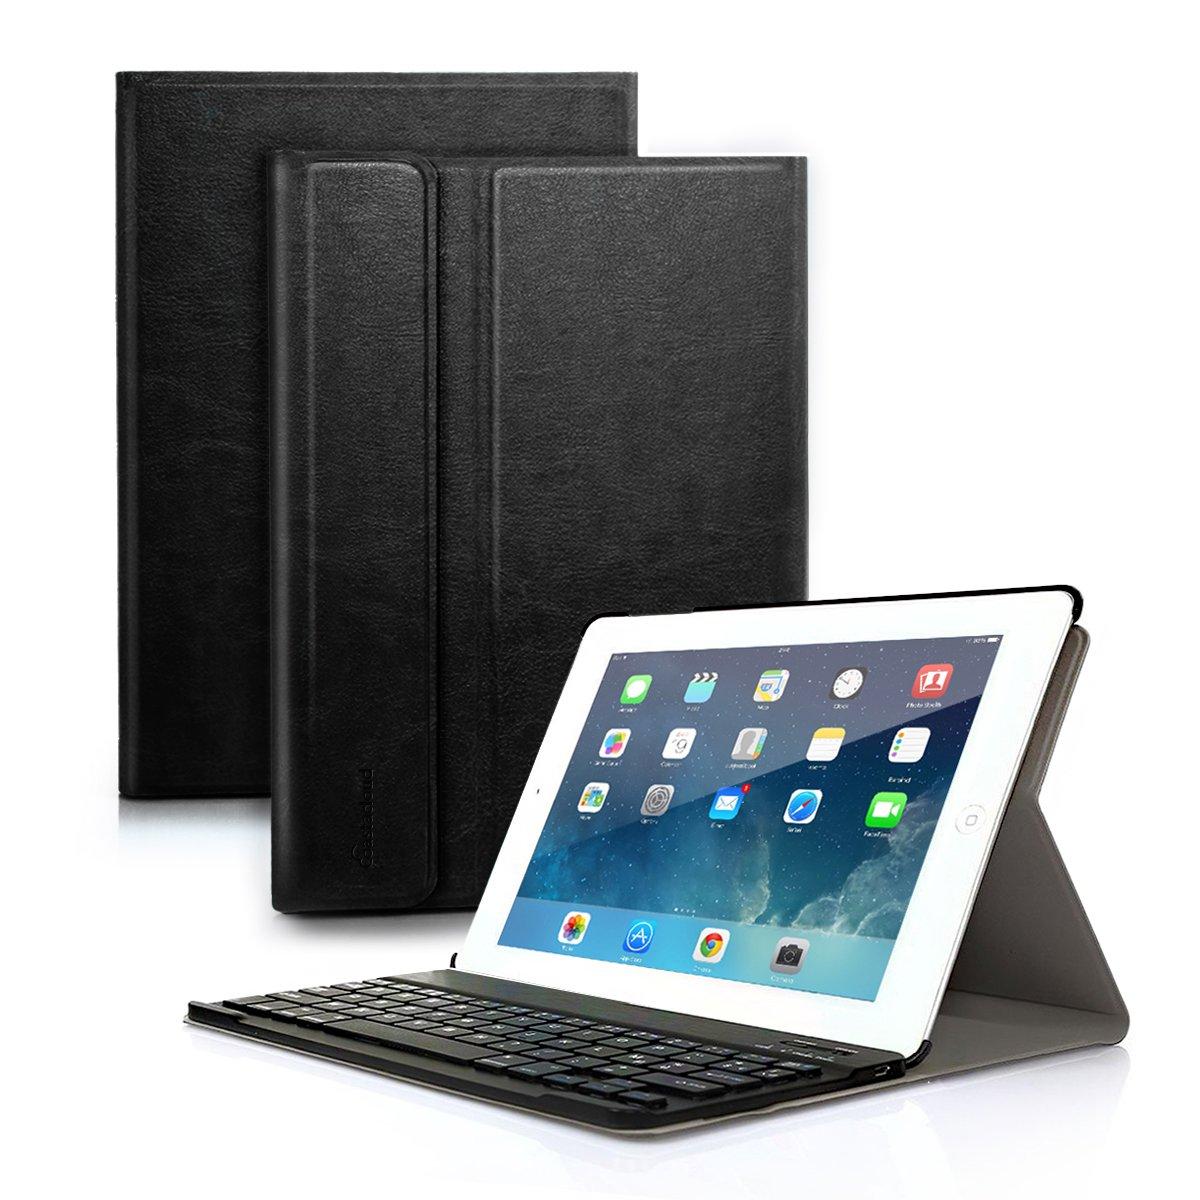 New 2018 iPad 9.7'', 2017 iPad, iPad Pro 9.7, iPad Air 1 Air 2 Keyboard Case - Detachable Bluetooth Keyboard with Anti-Slip Slim Folio Case Cover for iPad 9.7 Tablet - Black